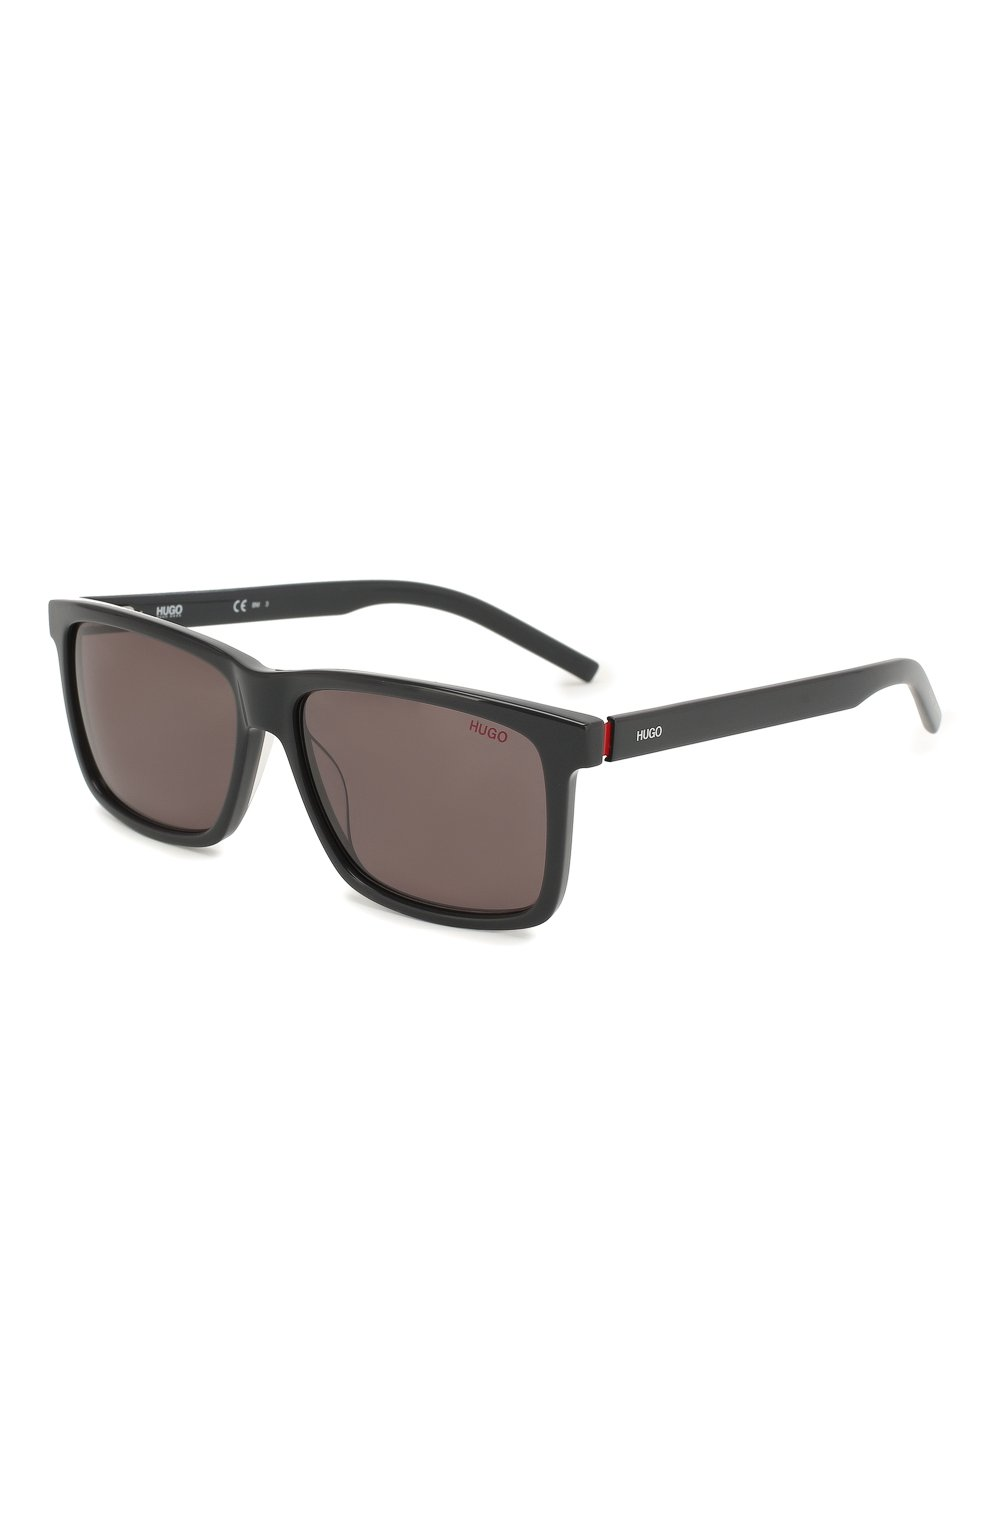 Мужские солнцезащитные очки BOSS темно-серого цвета, арт. 1013 KB7   Фото 1